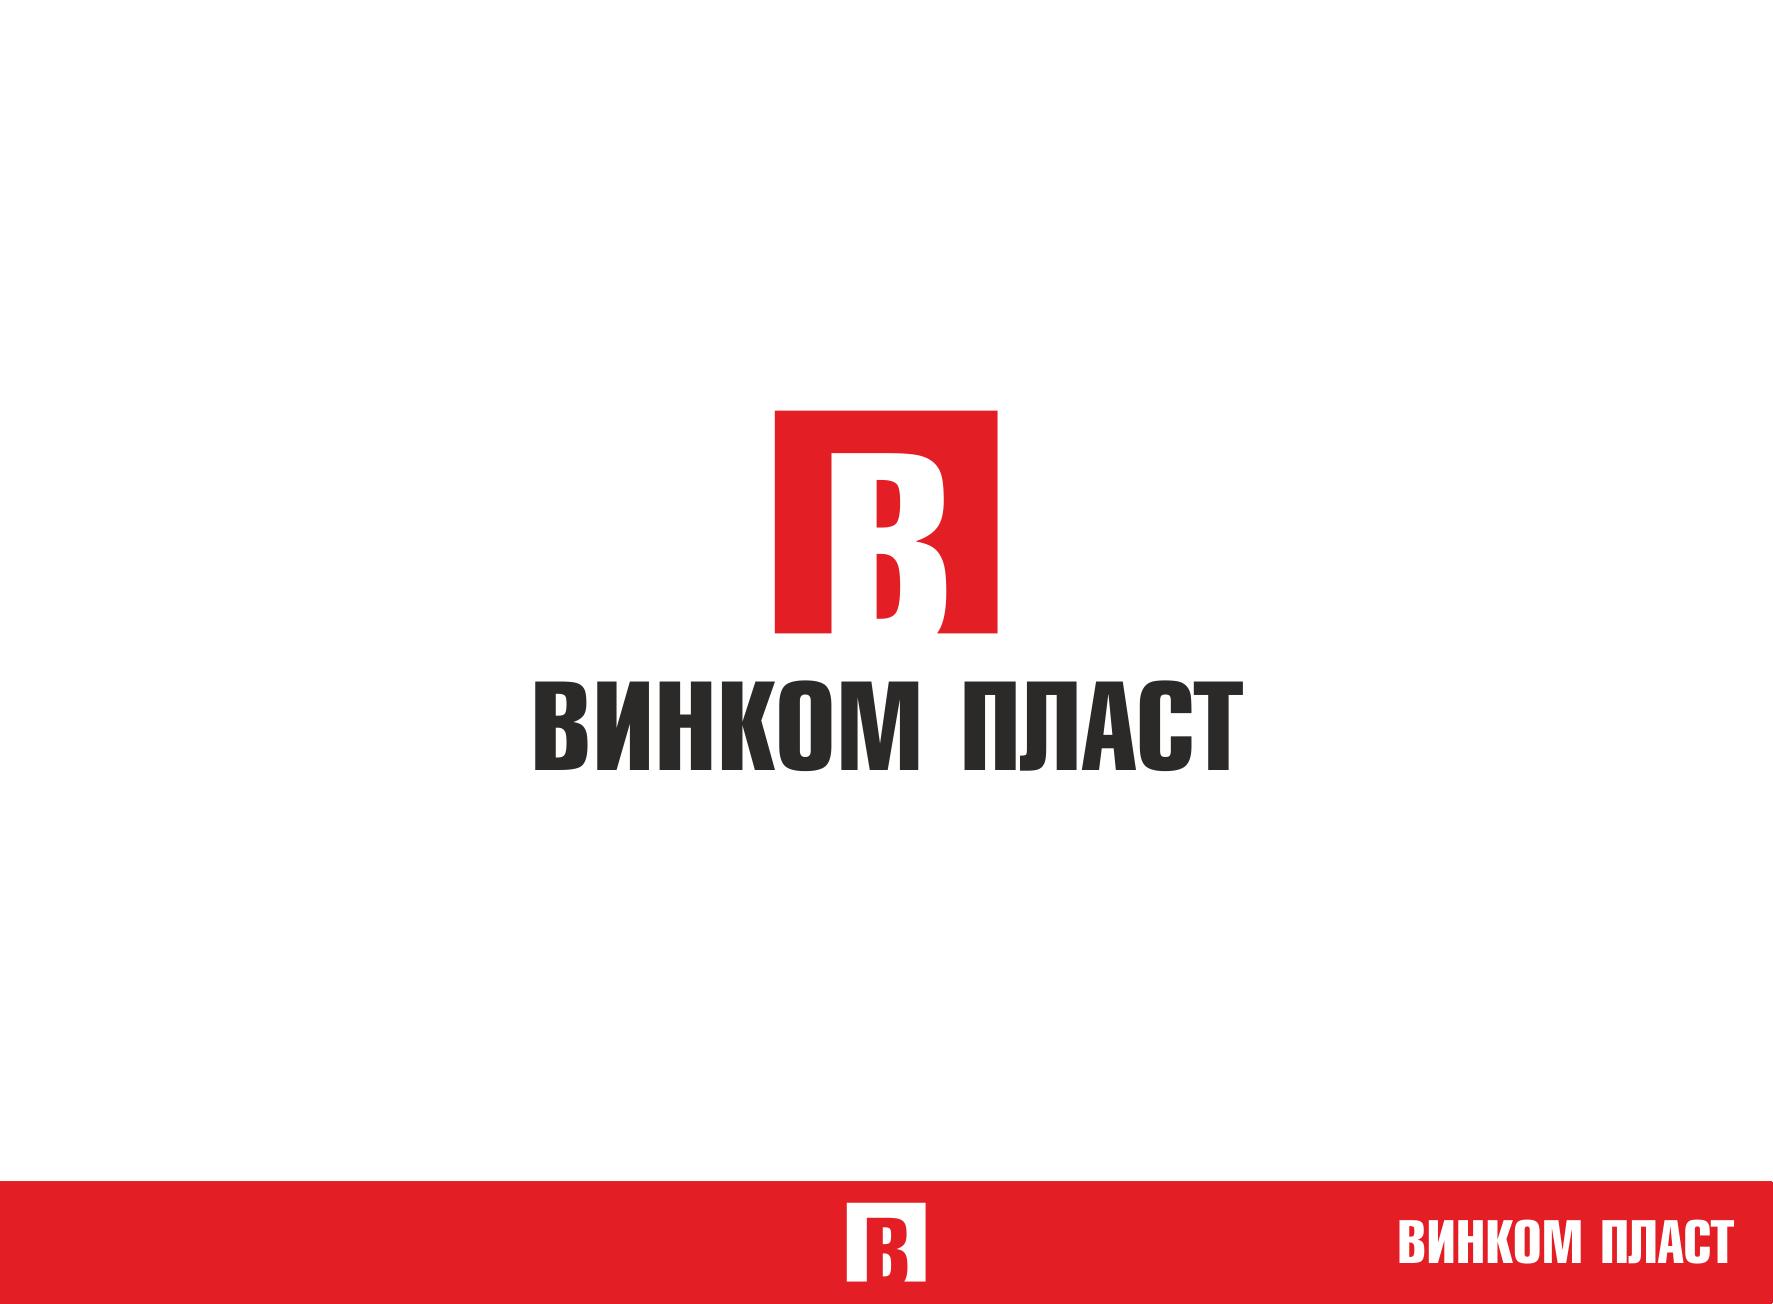 Логотип, фавикон и визитка для компании Винком Пласт  фото f_8445c36d075877a3.png